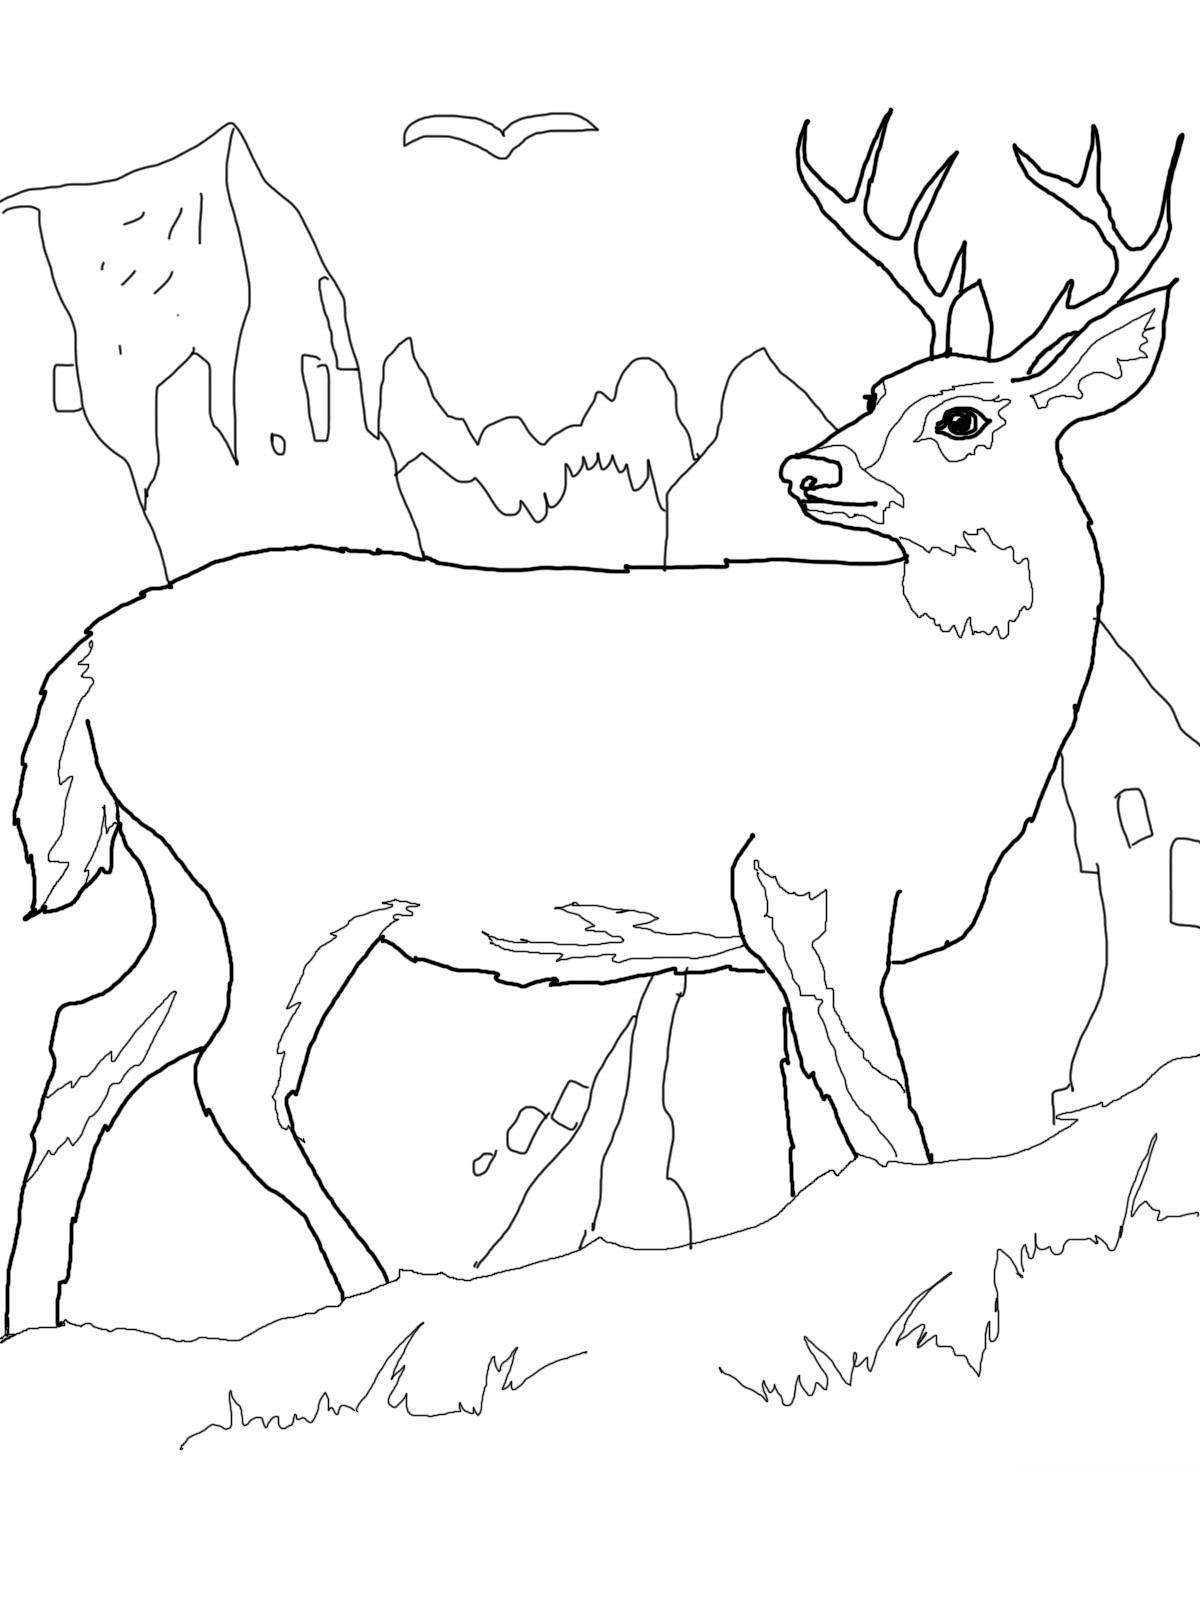 deer coloring page baby deer coloring pages printable kids colouring pages deer coloring page